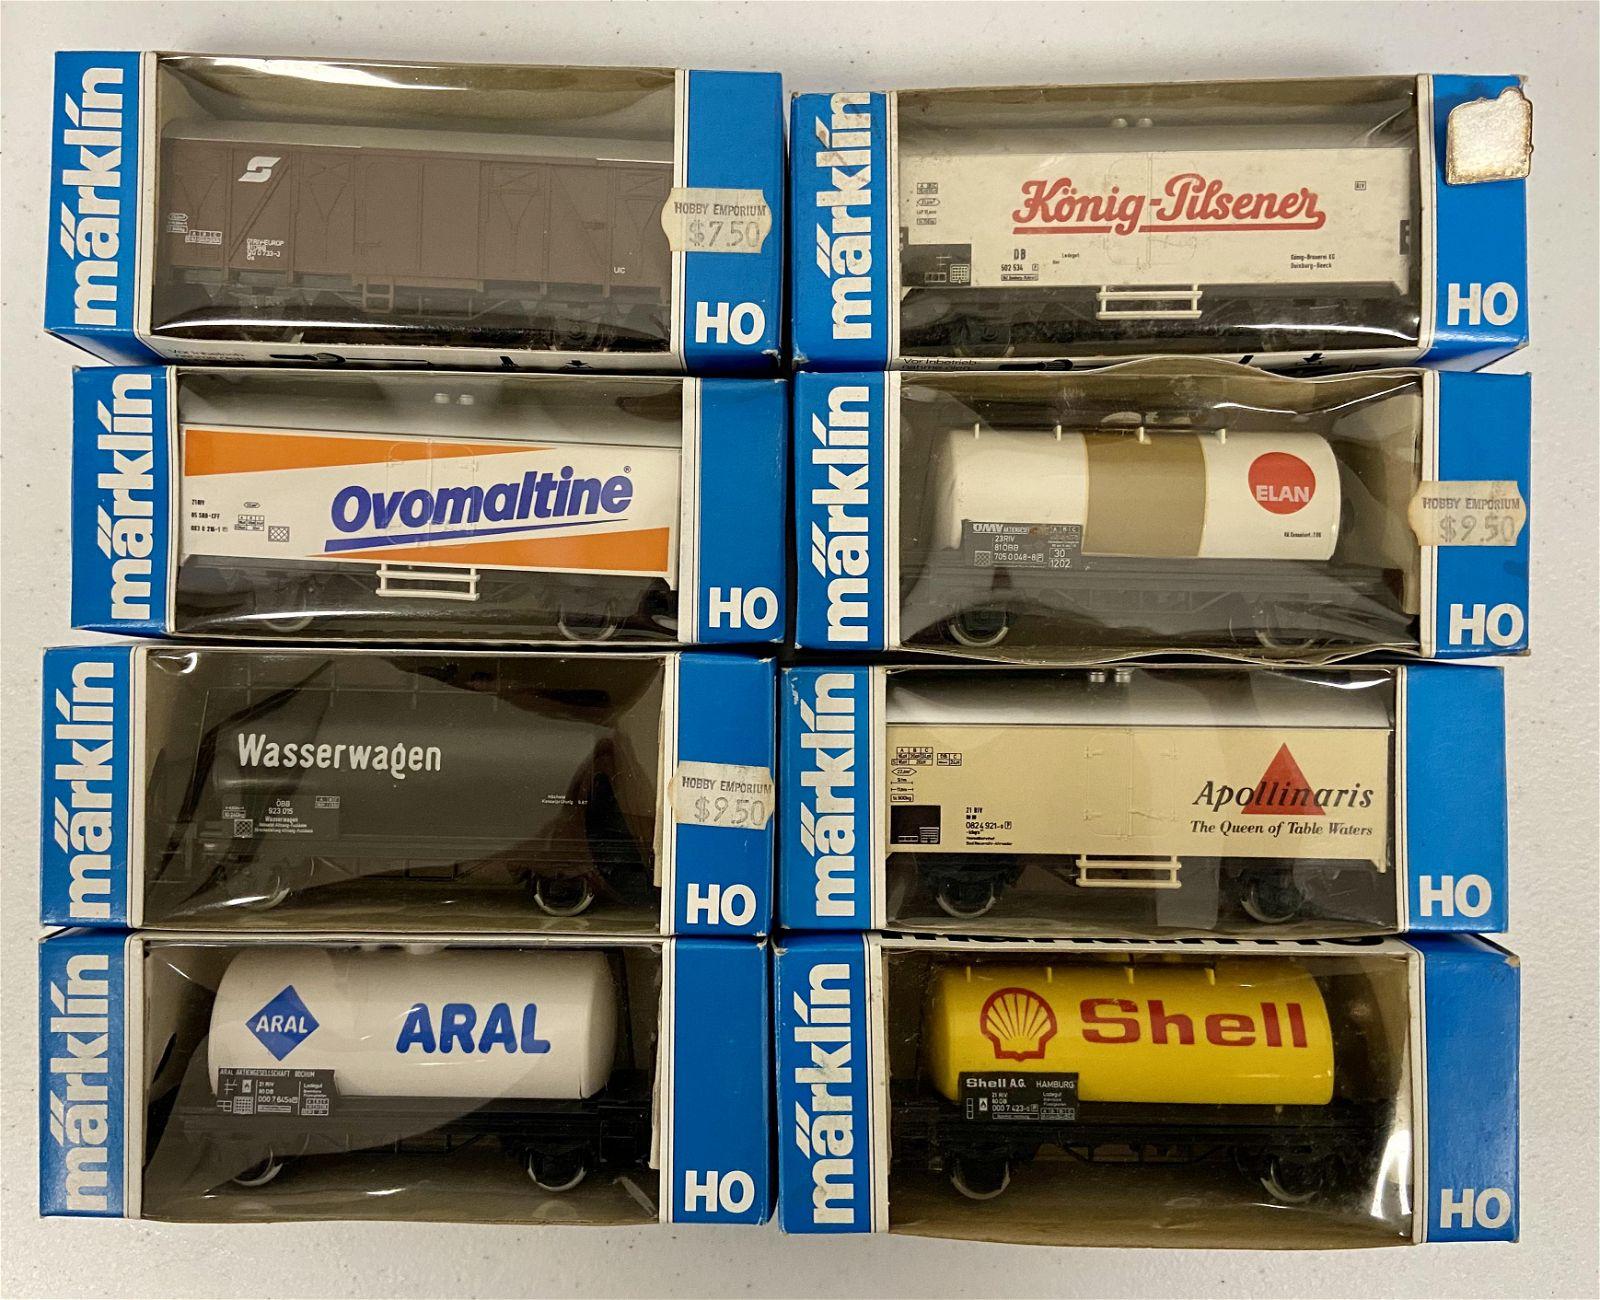 8 Marklin HO Cars, in boxes